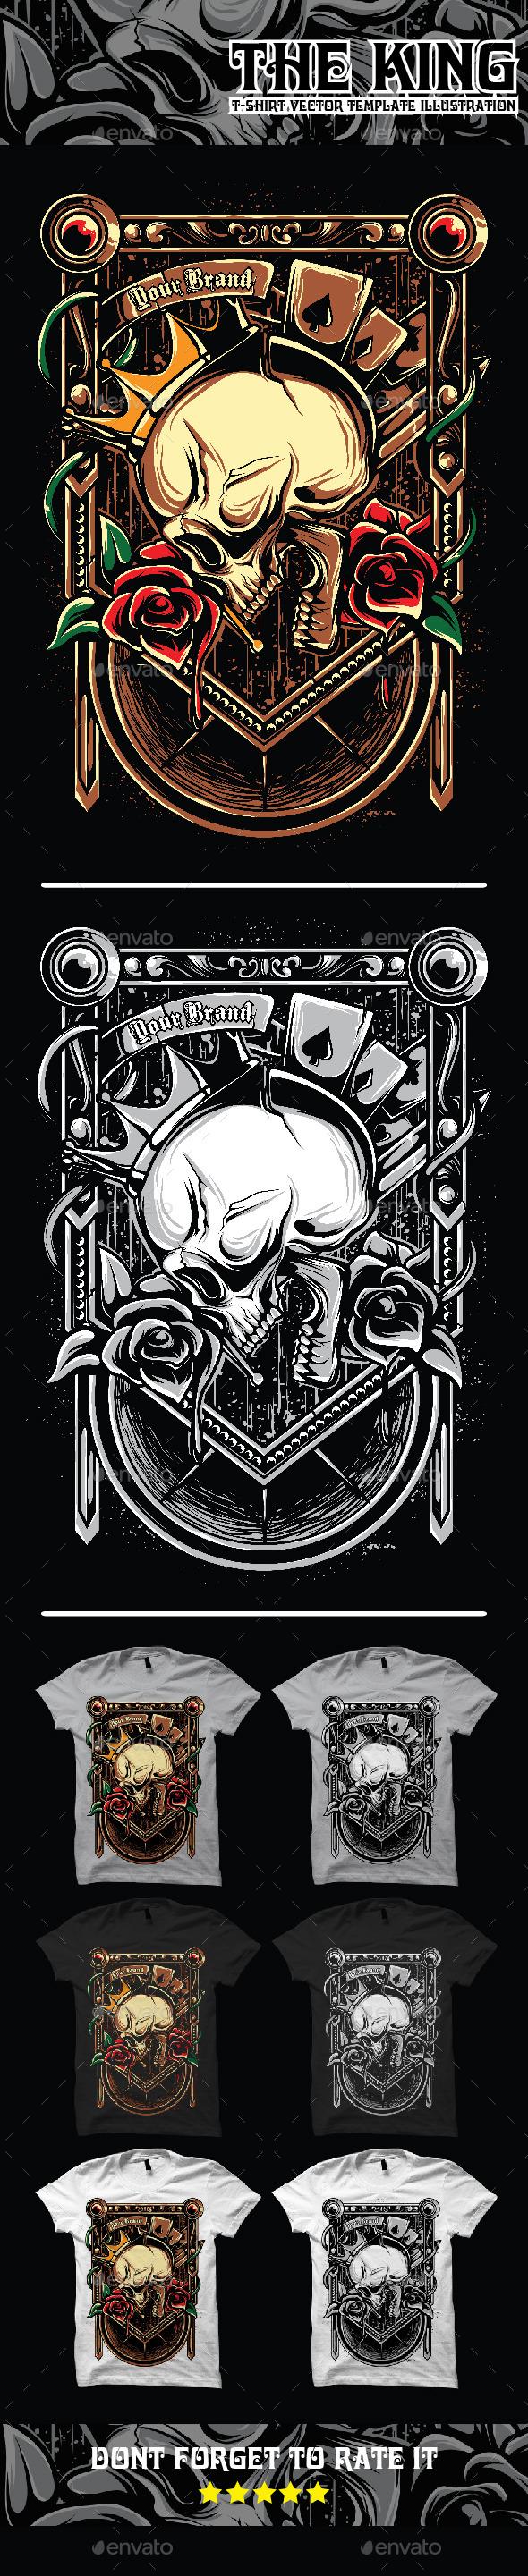 The King Skull Art Illustration Tshirt Template - Designs T-Shirts